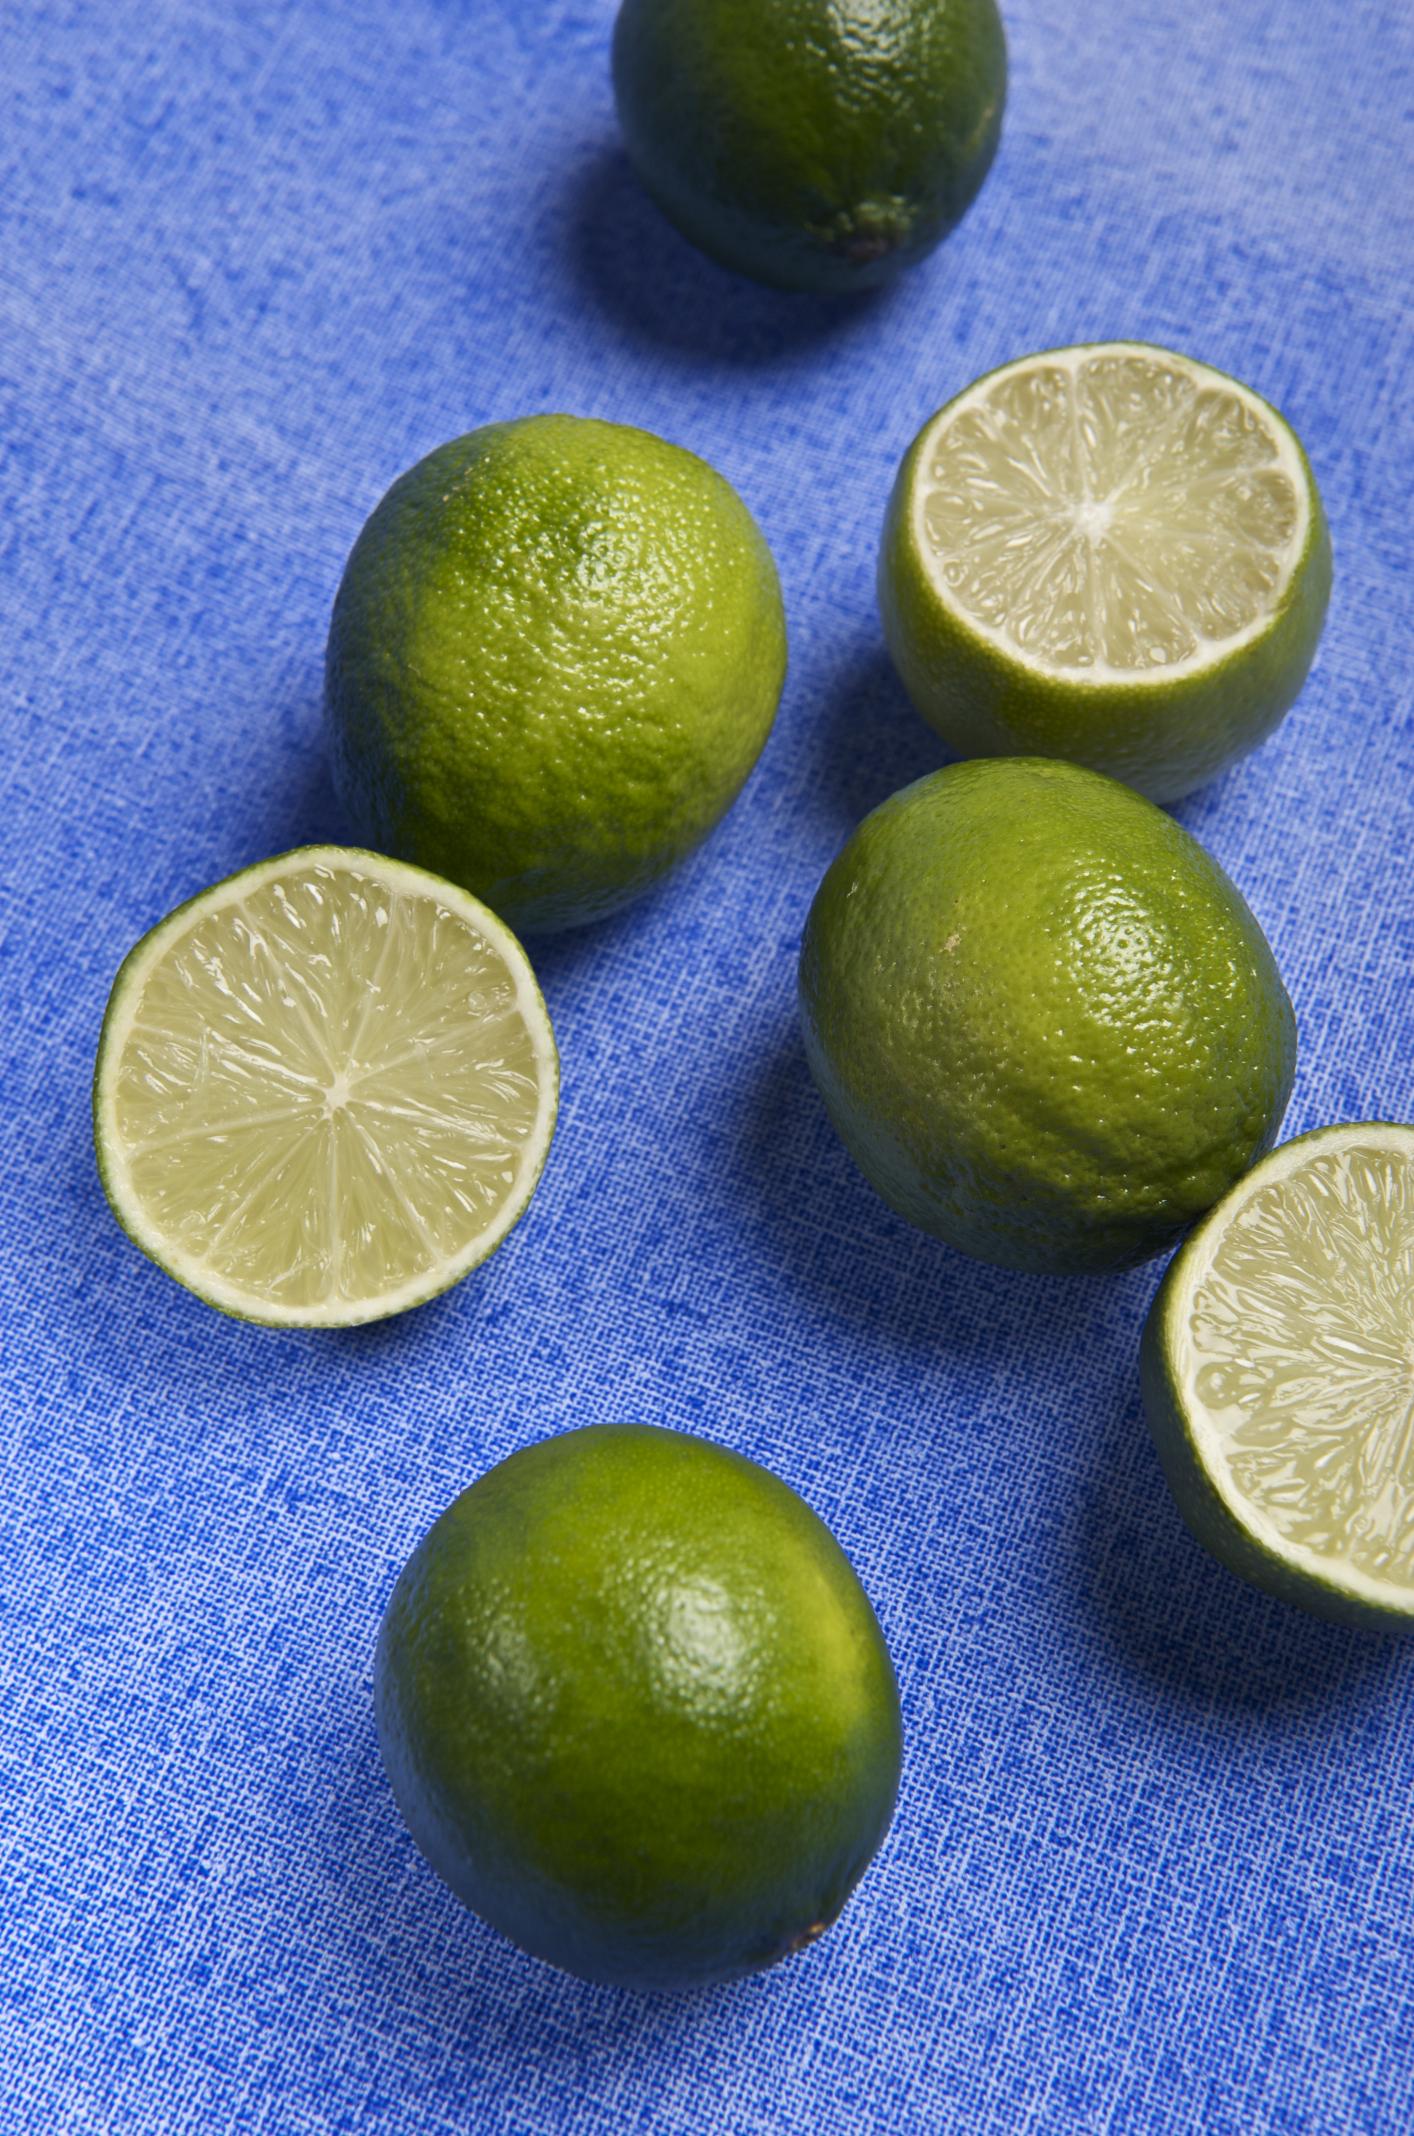 Limes On Blue (4254408531).jpg